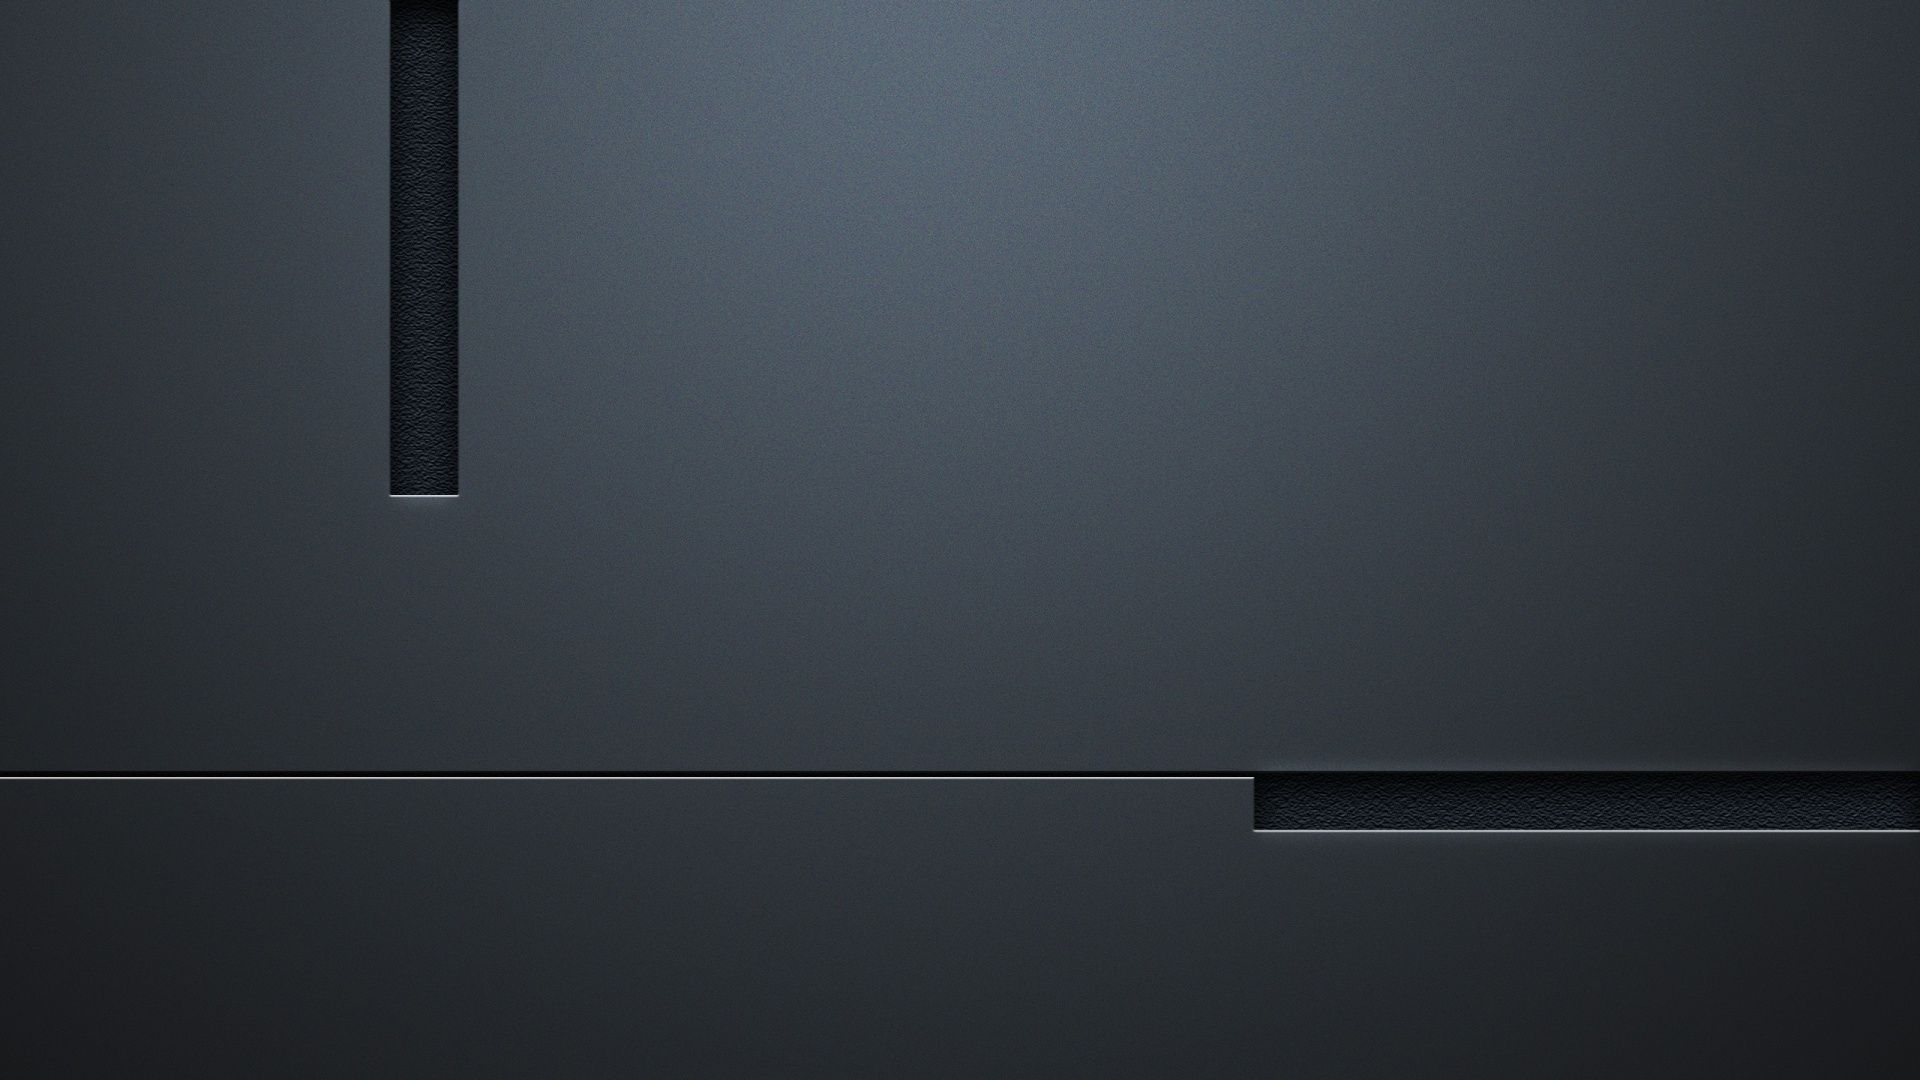 Windows 10 Wallpaper Hd 1920x1080 Cars Grey Abstract Wallpaper 12 1920x1080